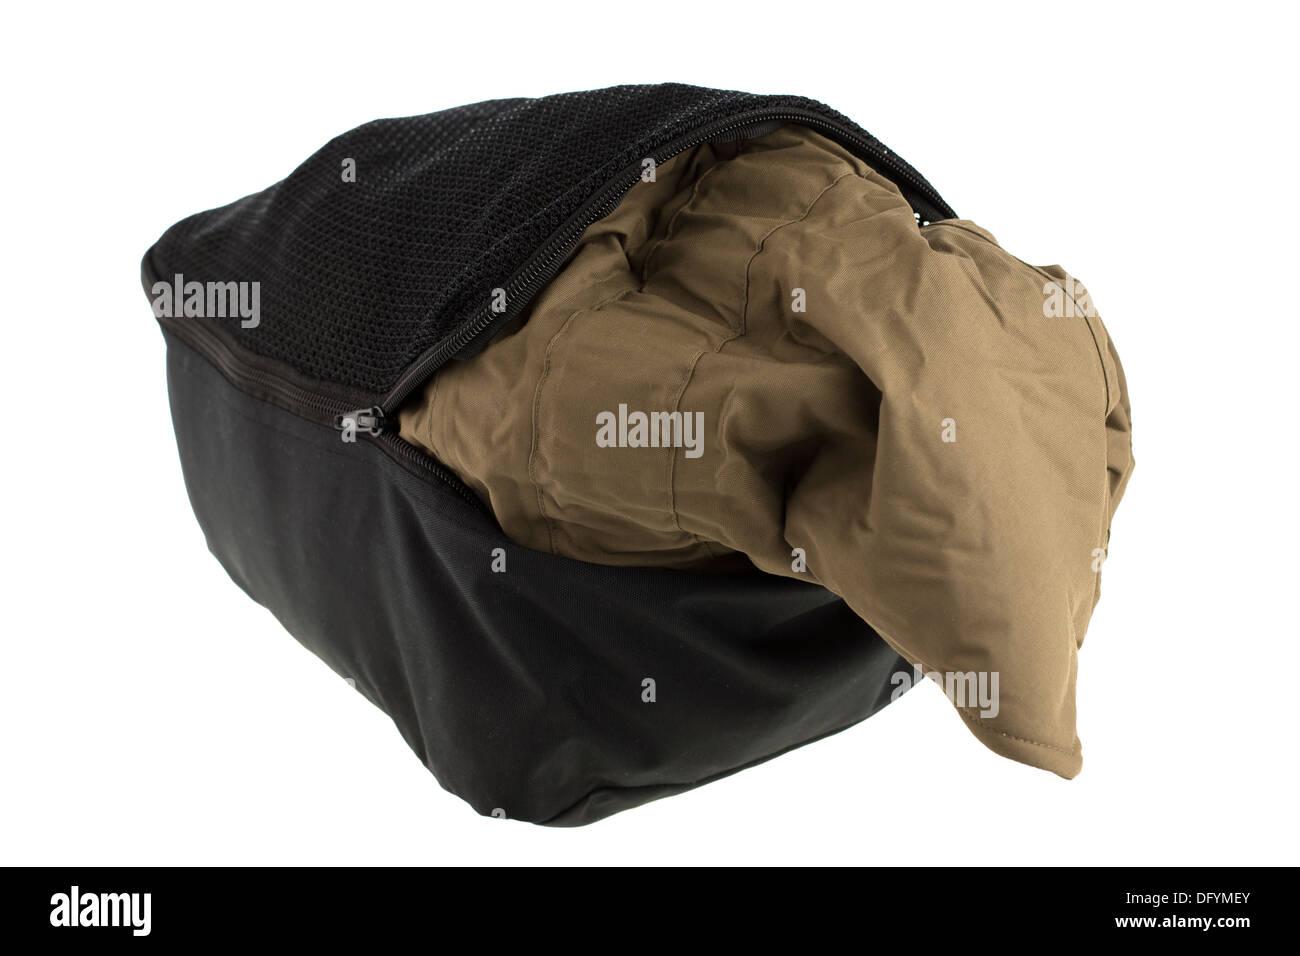 Clothing item stuffed into a zipped black stuff bag - Stock Image